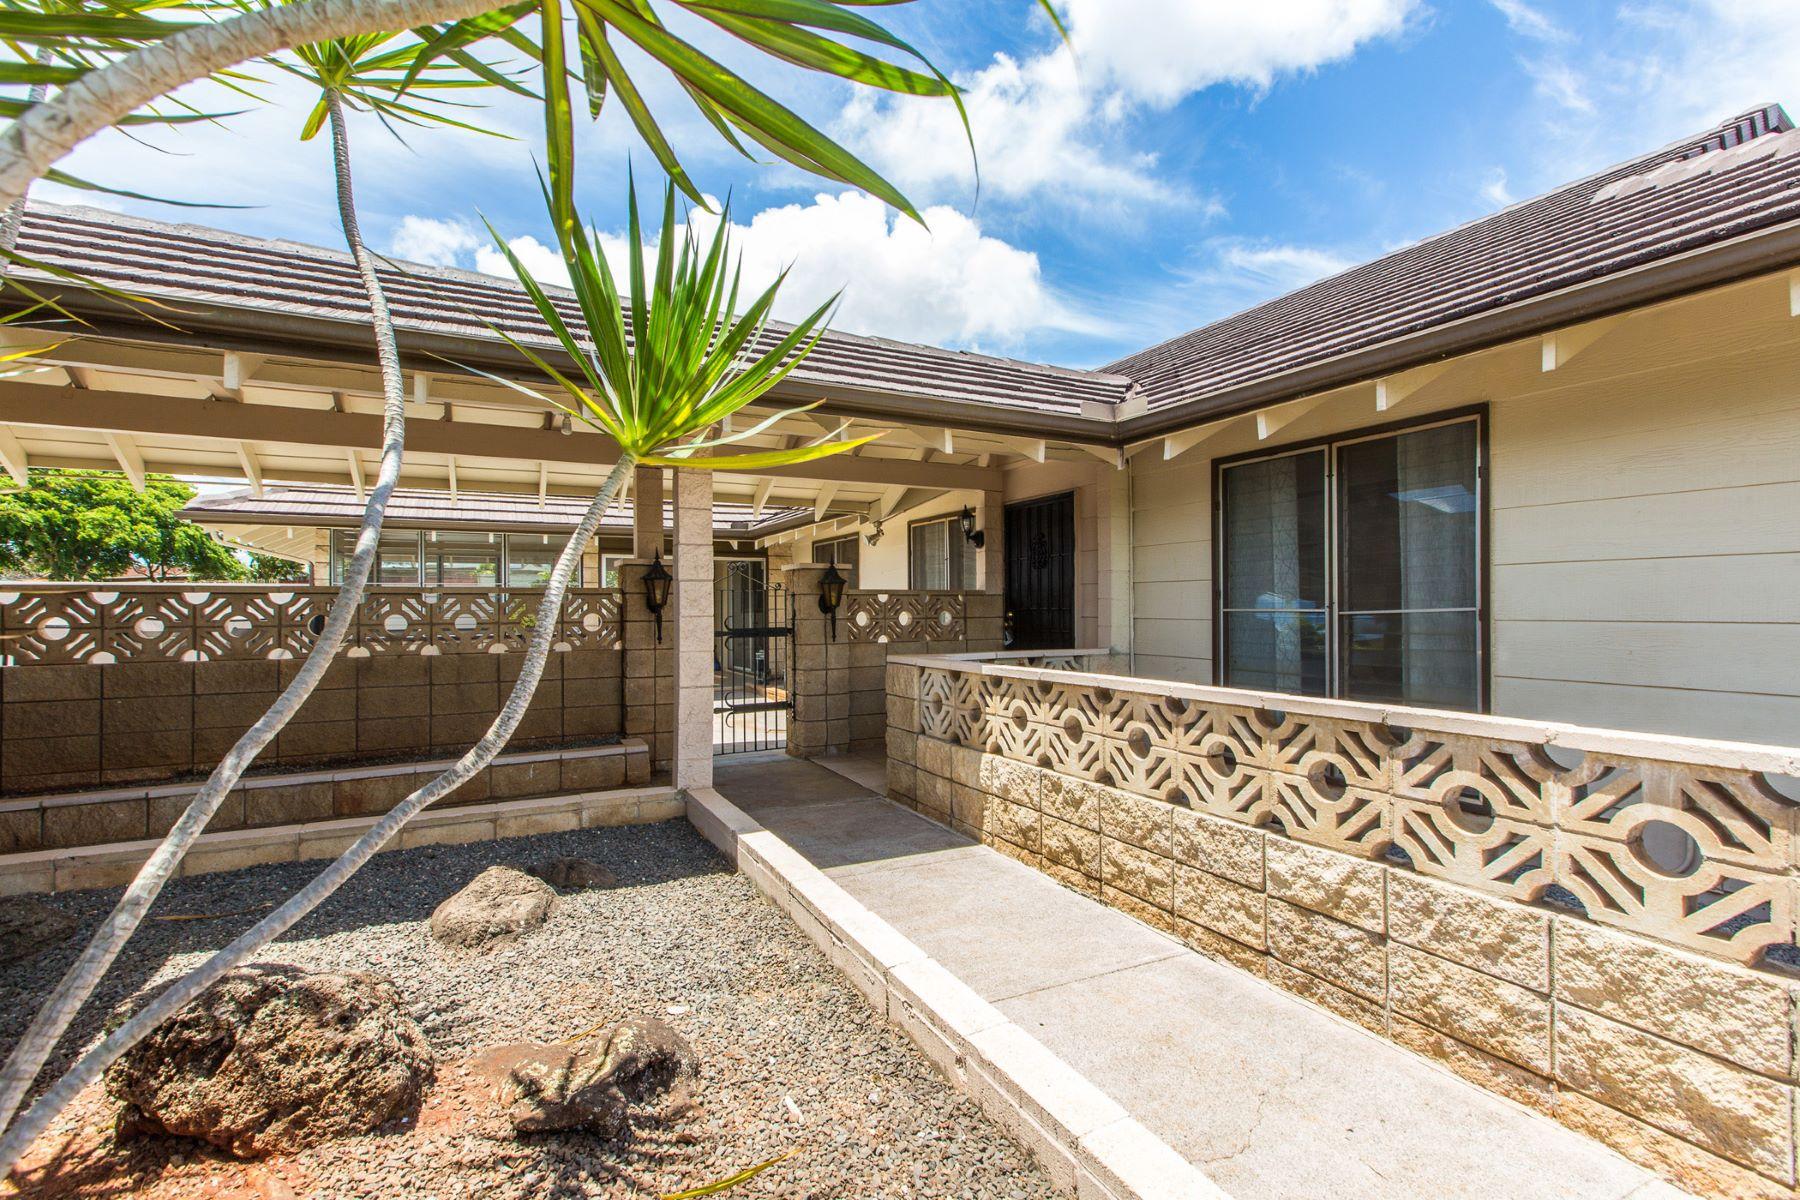 独户住宅 为 销售 在 Remodeled Mililani 95-201 Kahiku Place Mililani, 夏威夷 96789 美国